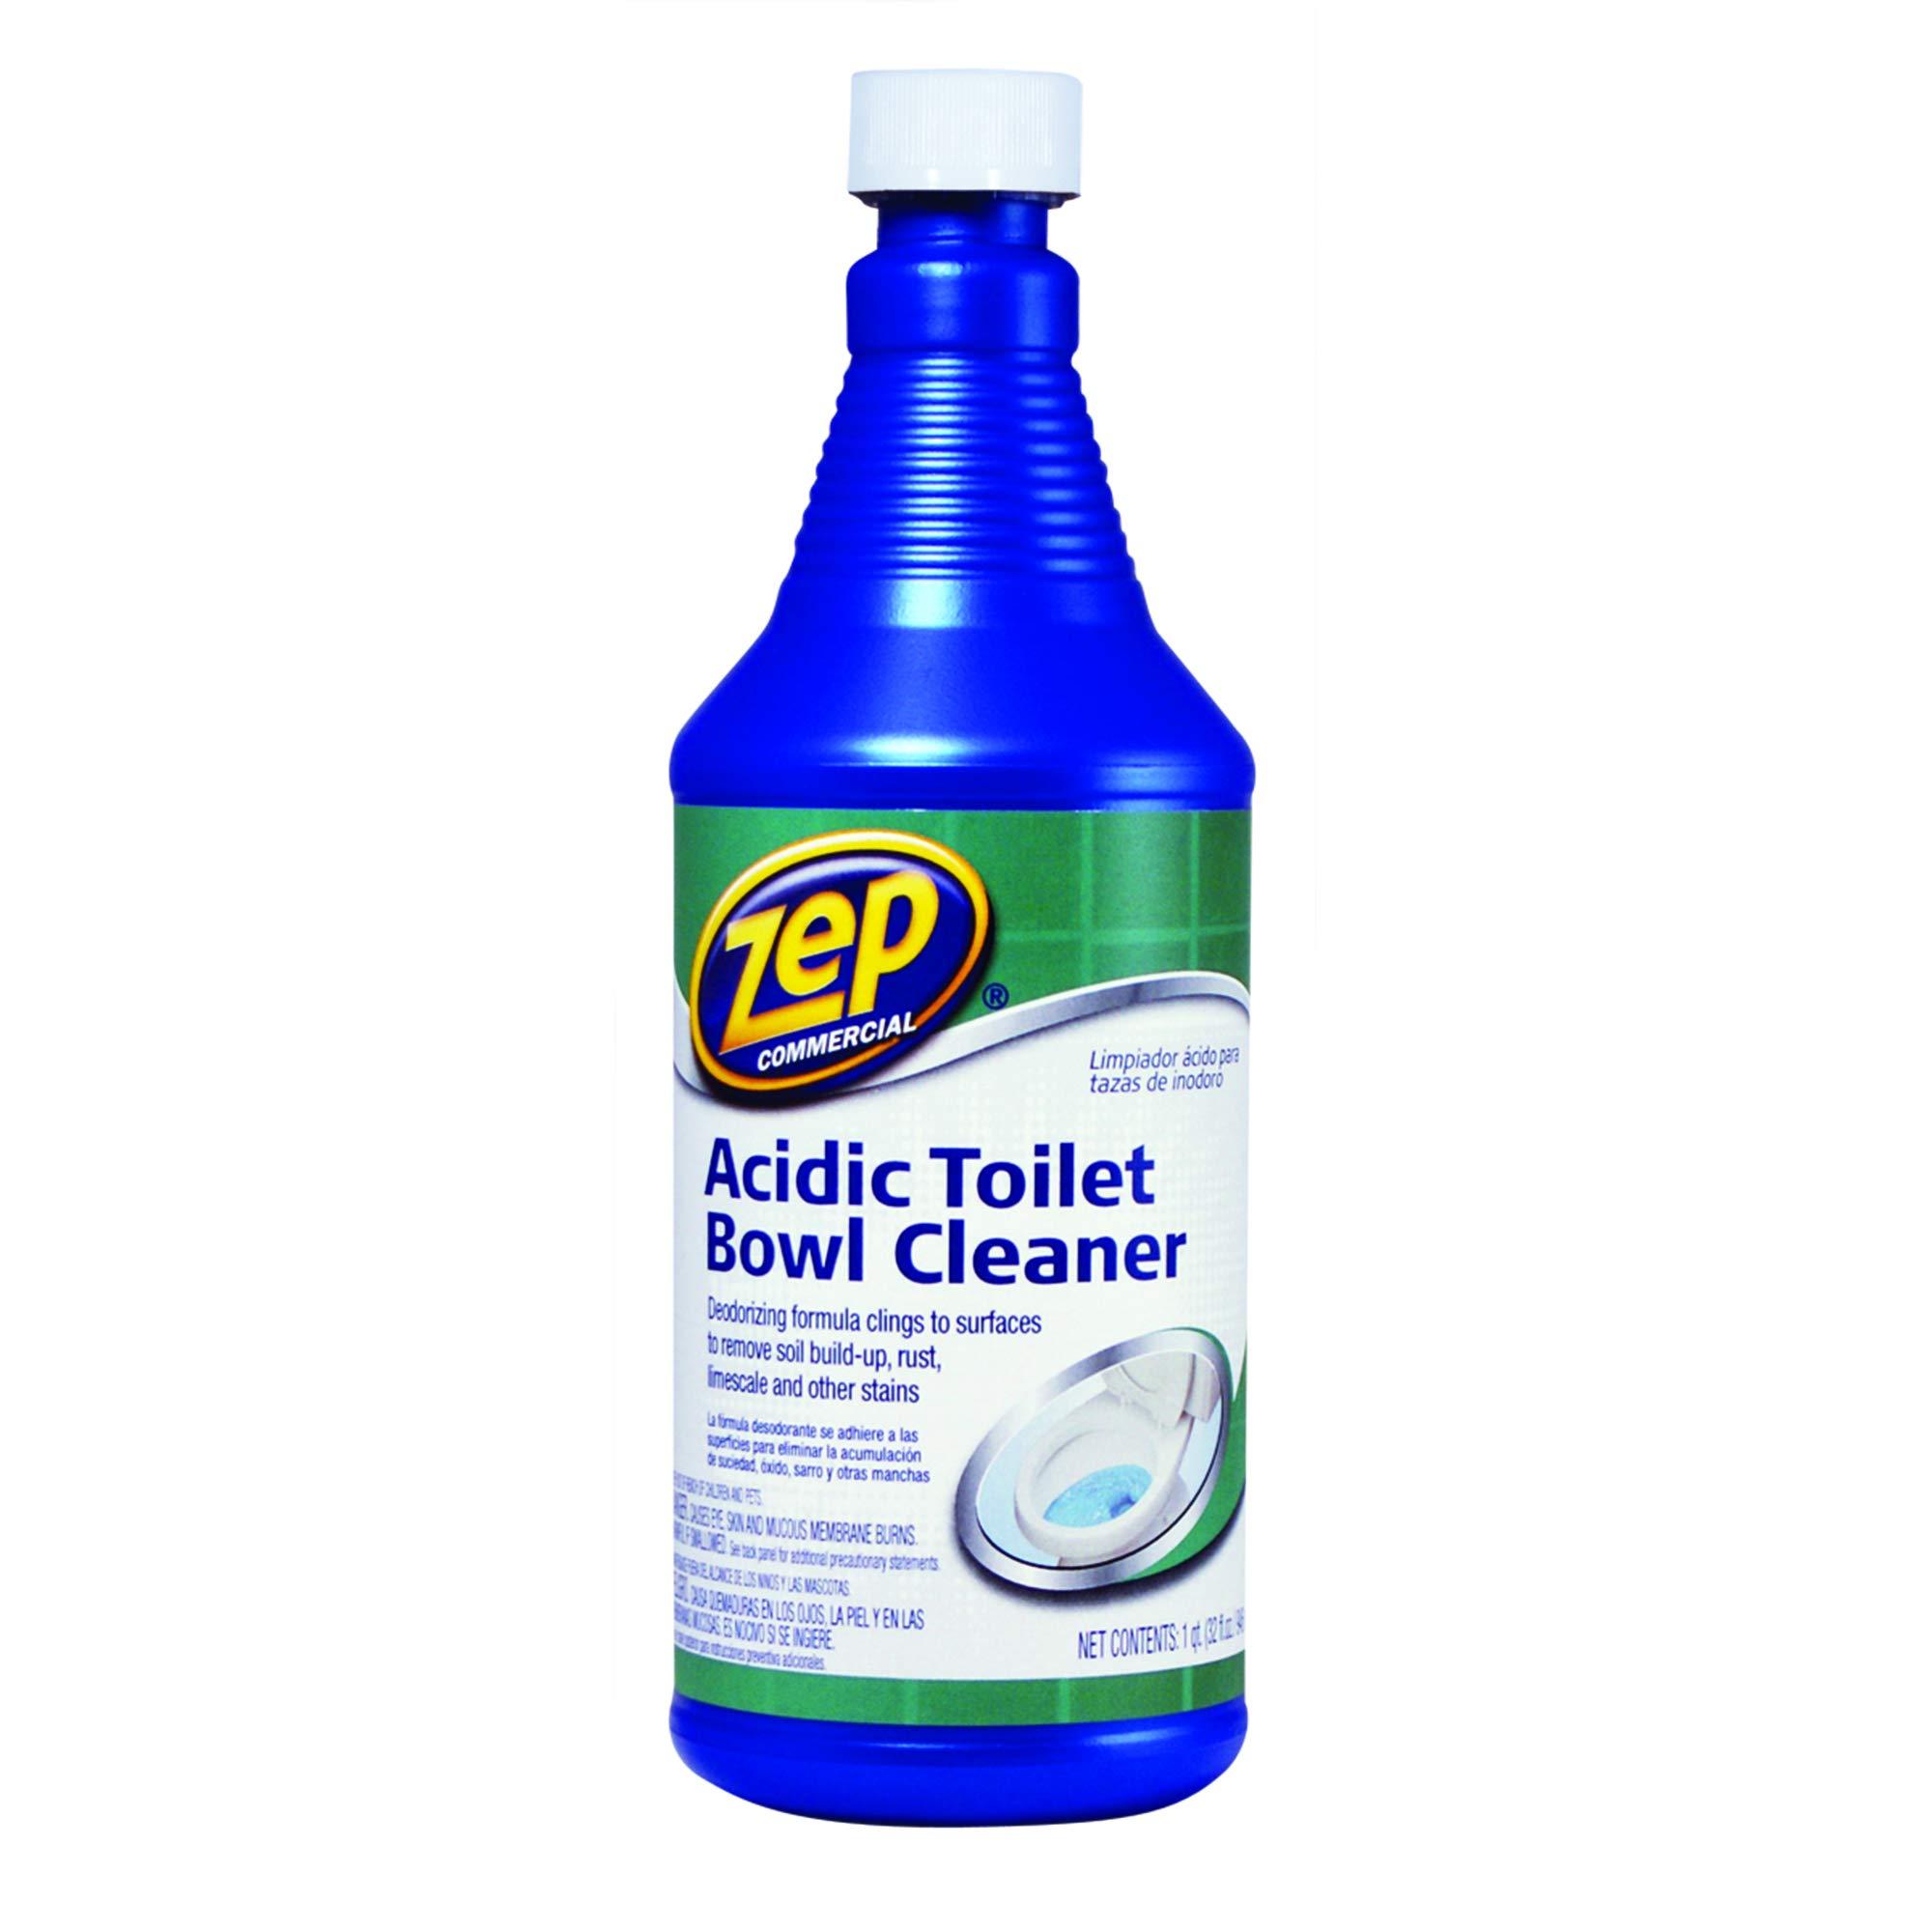 Zep Commercial Acidic Toilet Bowl Cleaner,